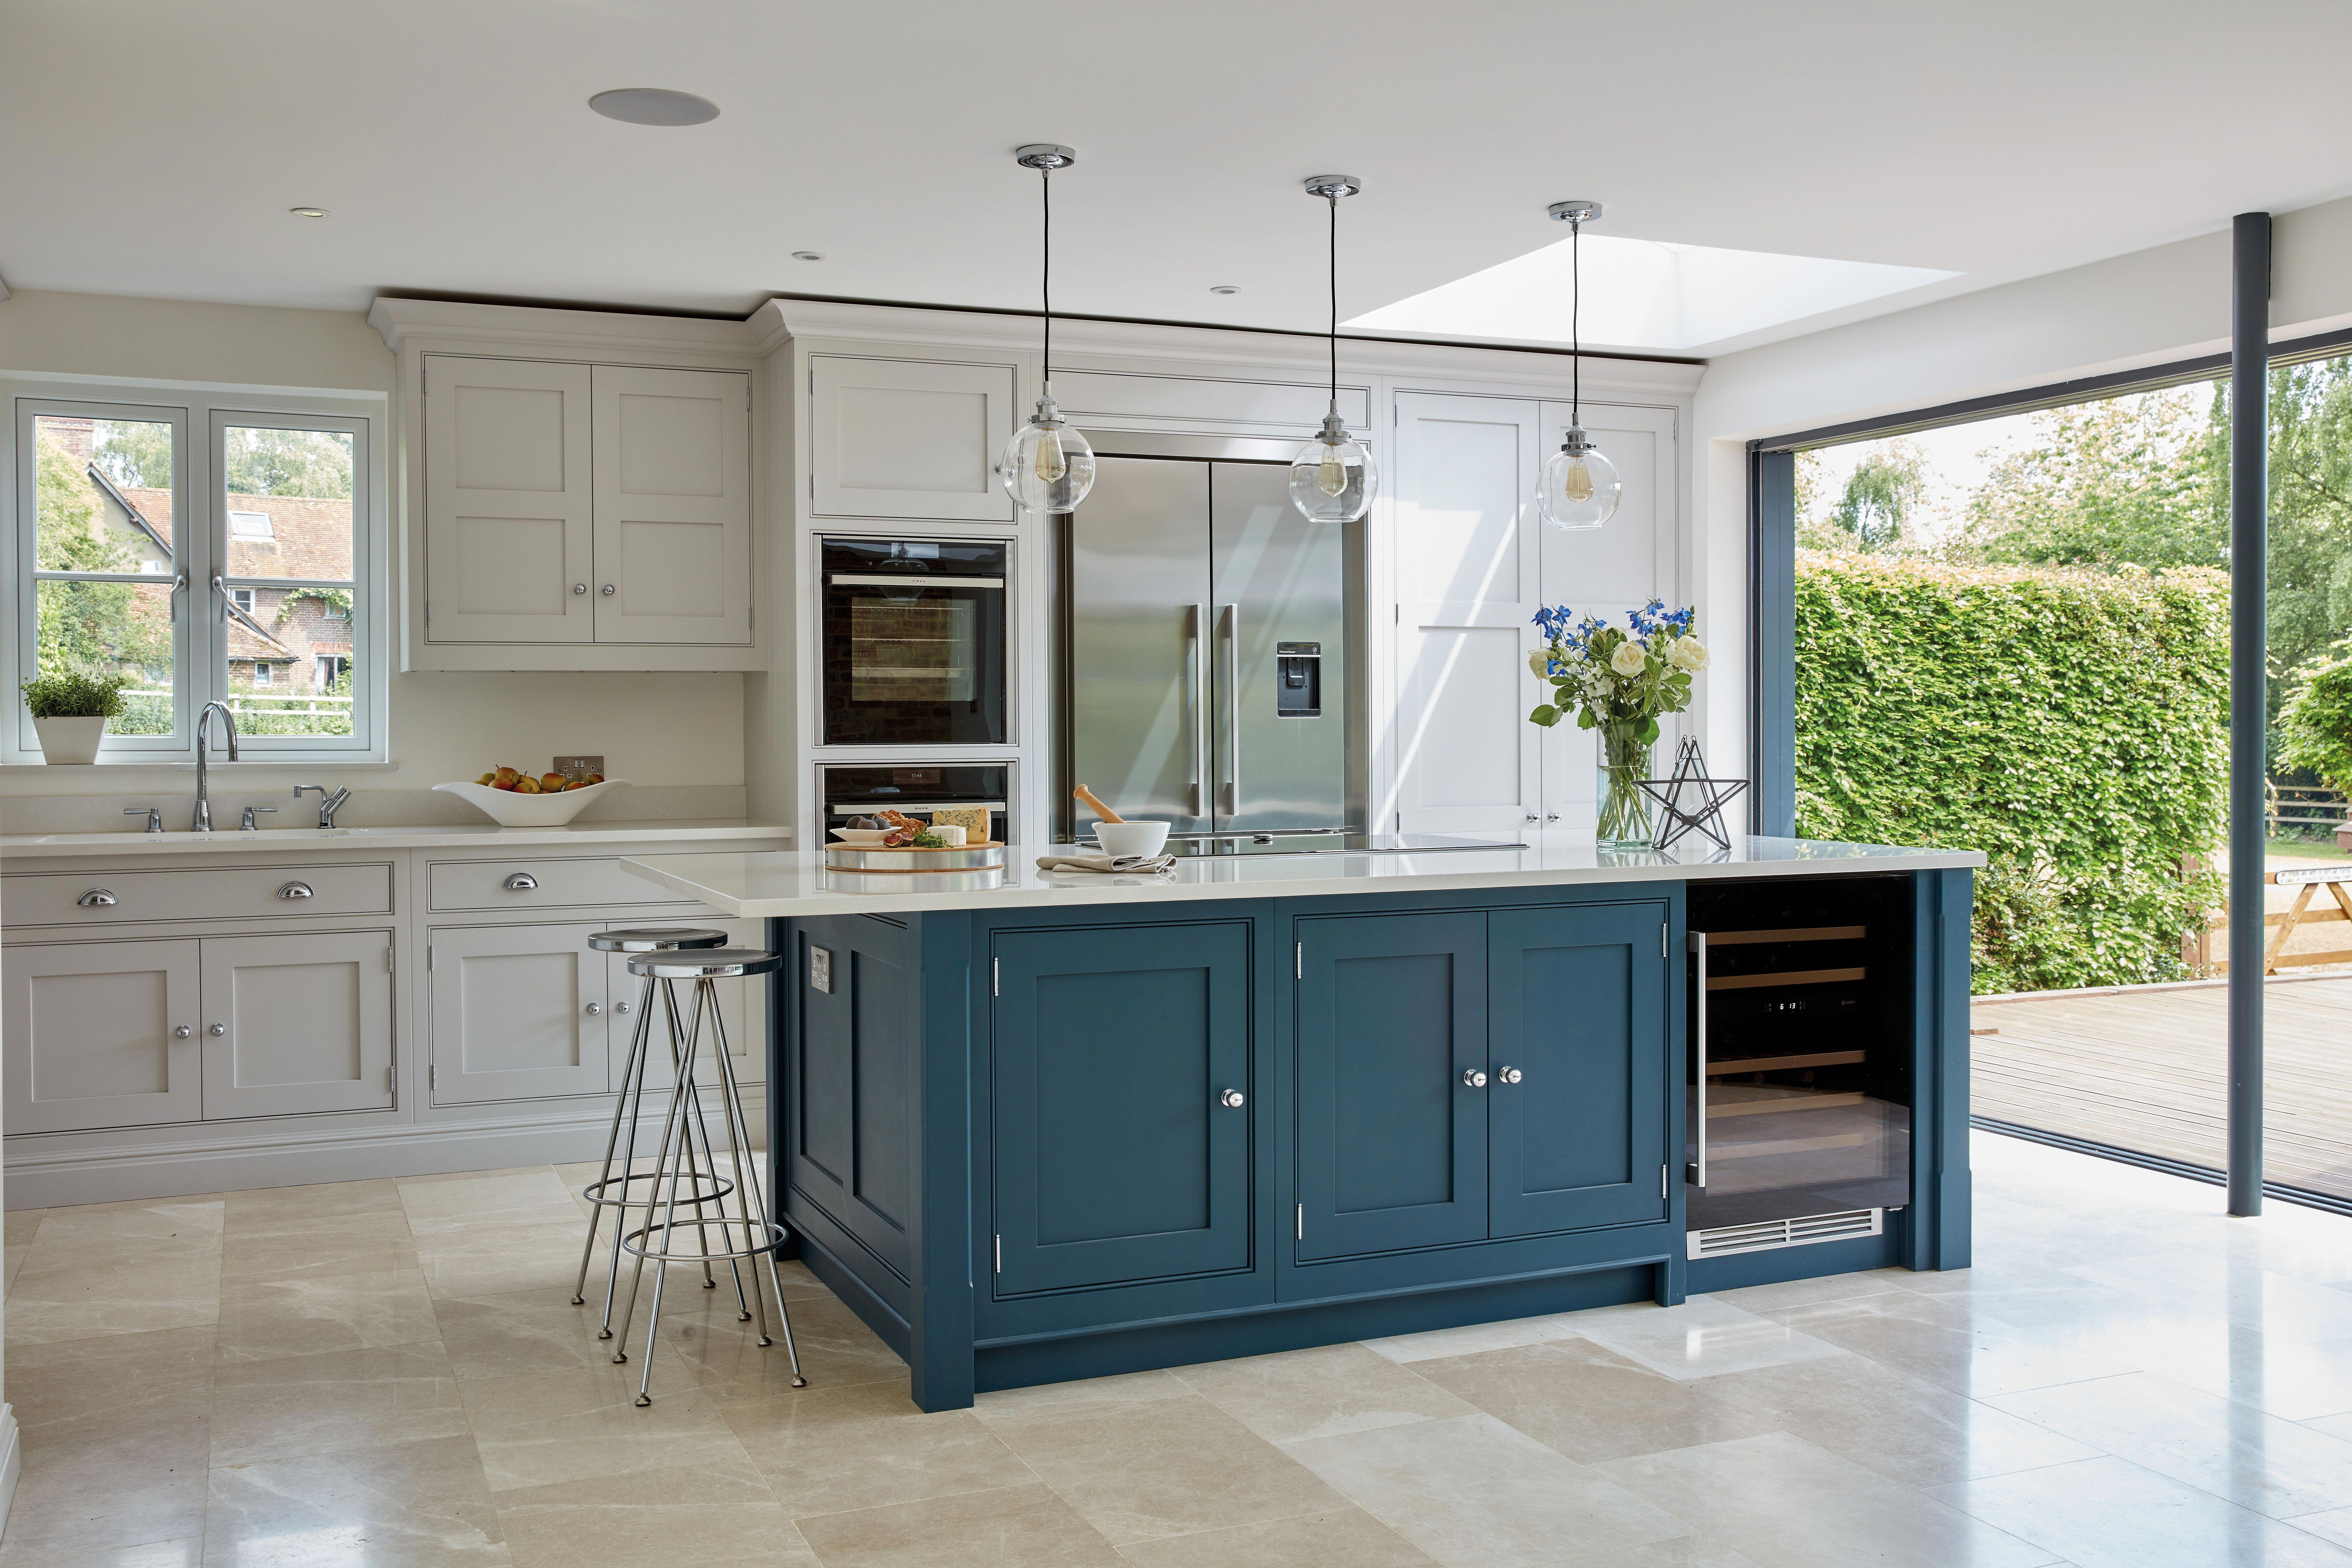 Blue Shaker Kitchen Tom Howley Shaker Style Kitchens Blue Shaker Kitchen Kitchen Remodel